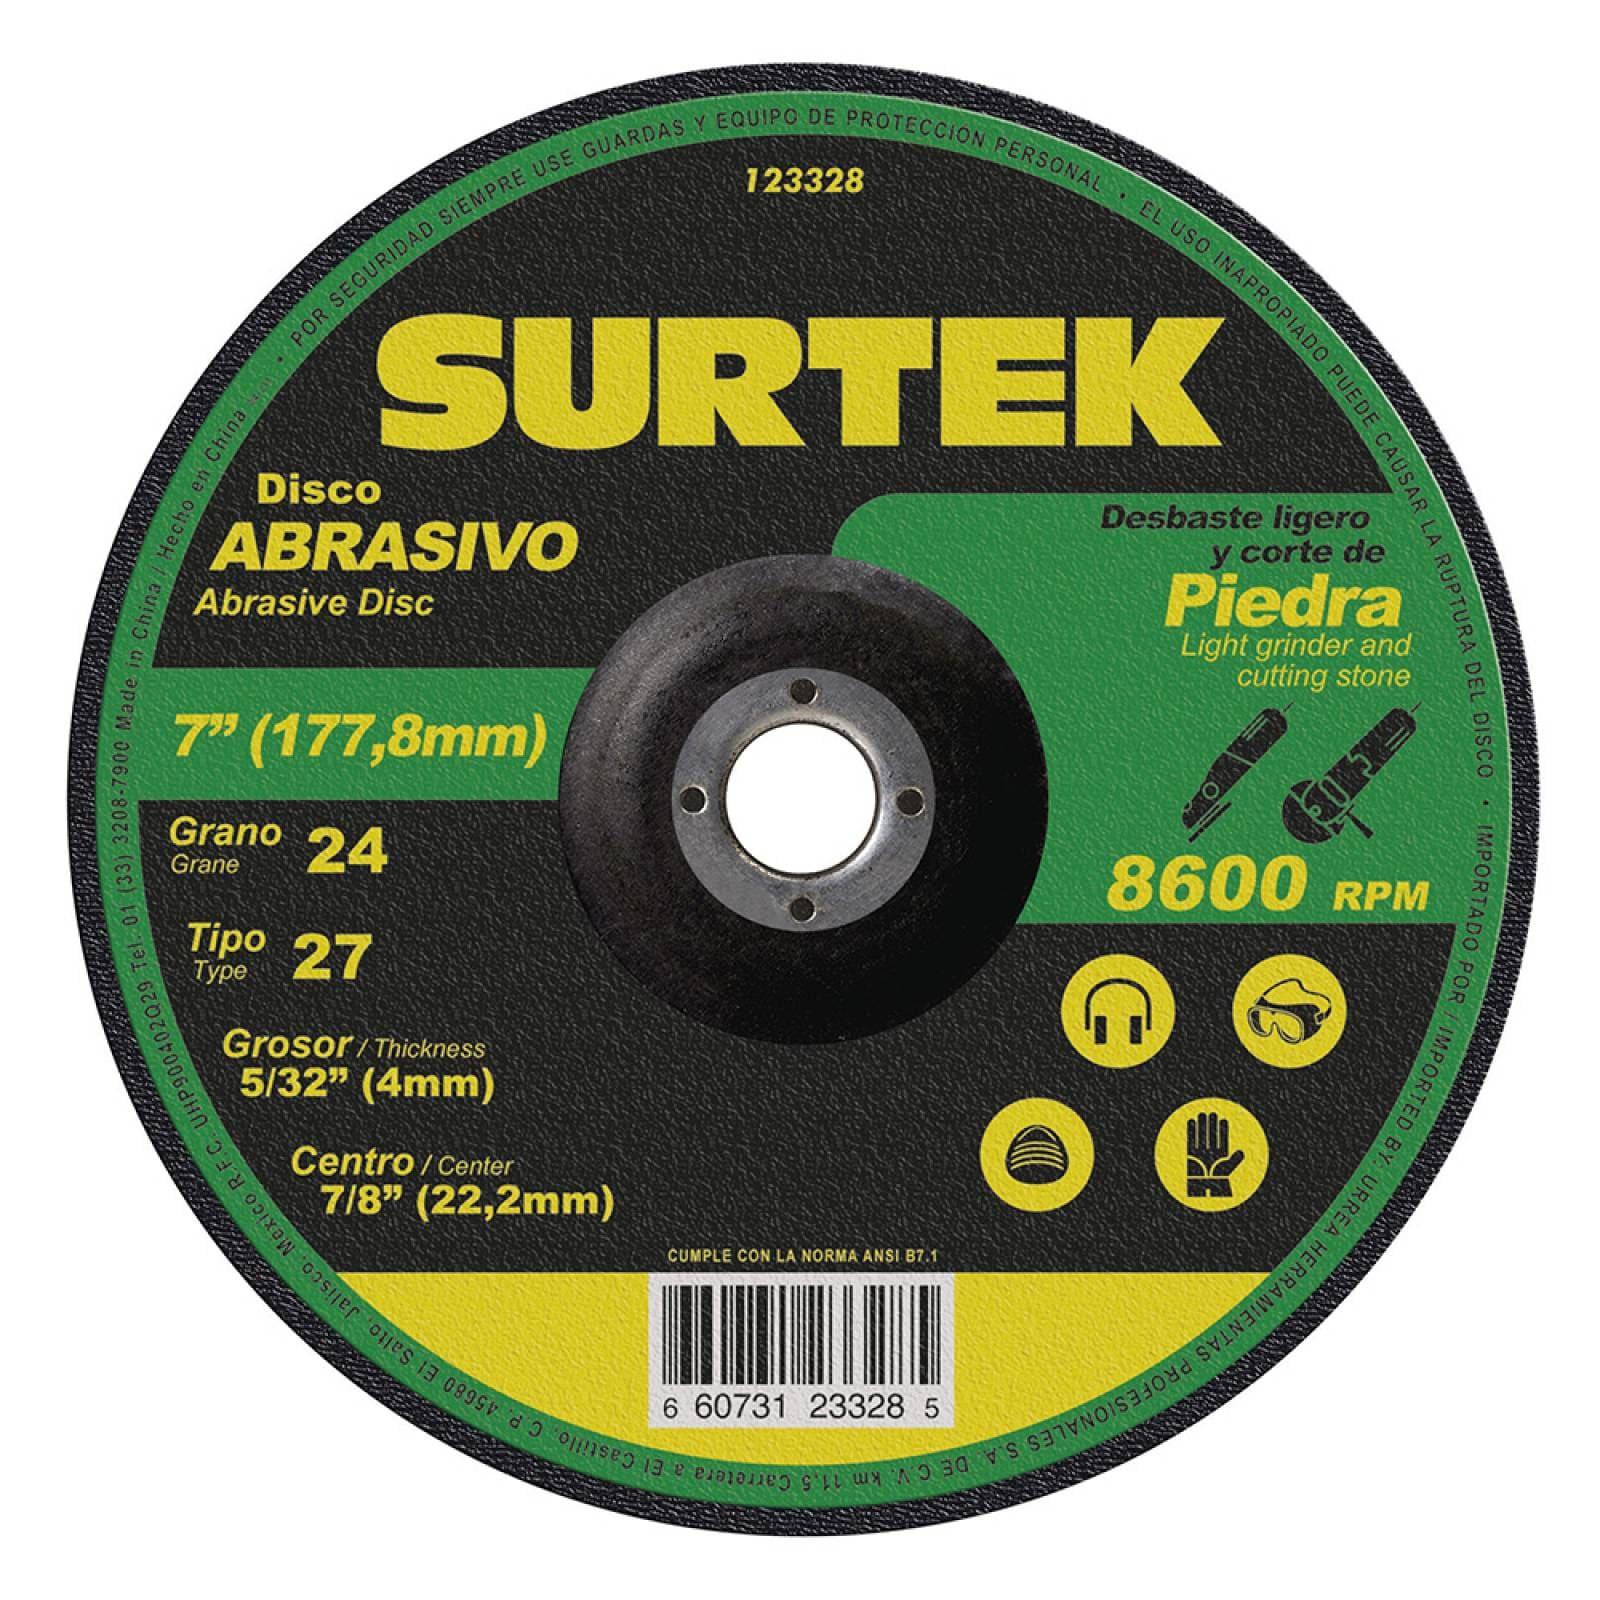 "Disco T/27 Piedra 7X5/32"" 123328 Surtek"